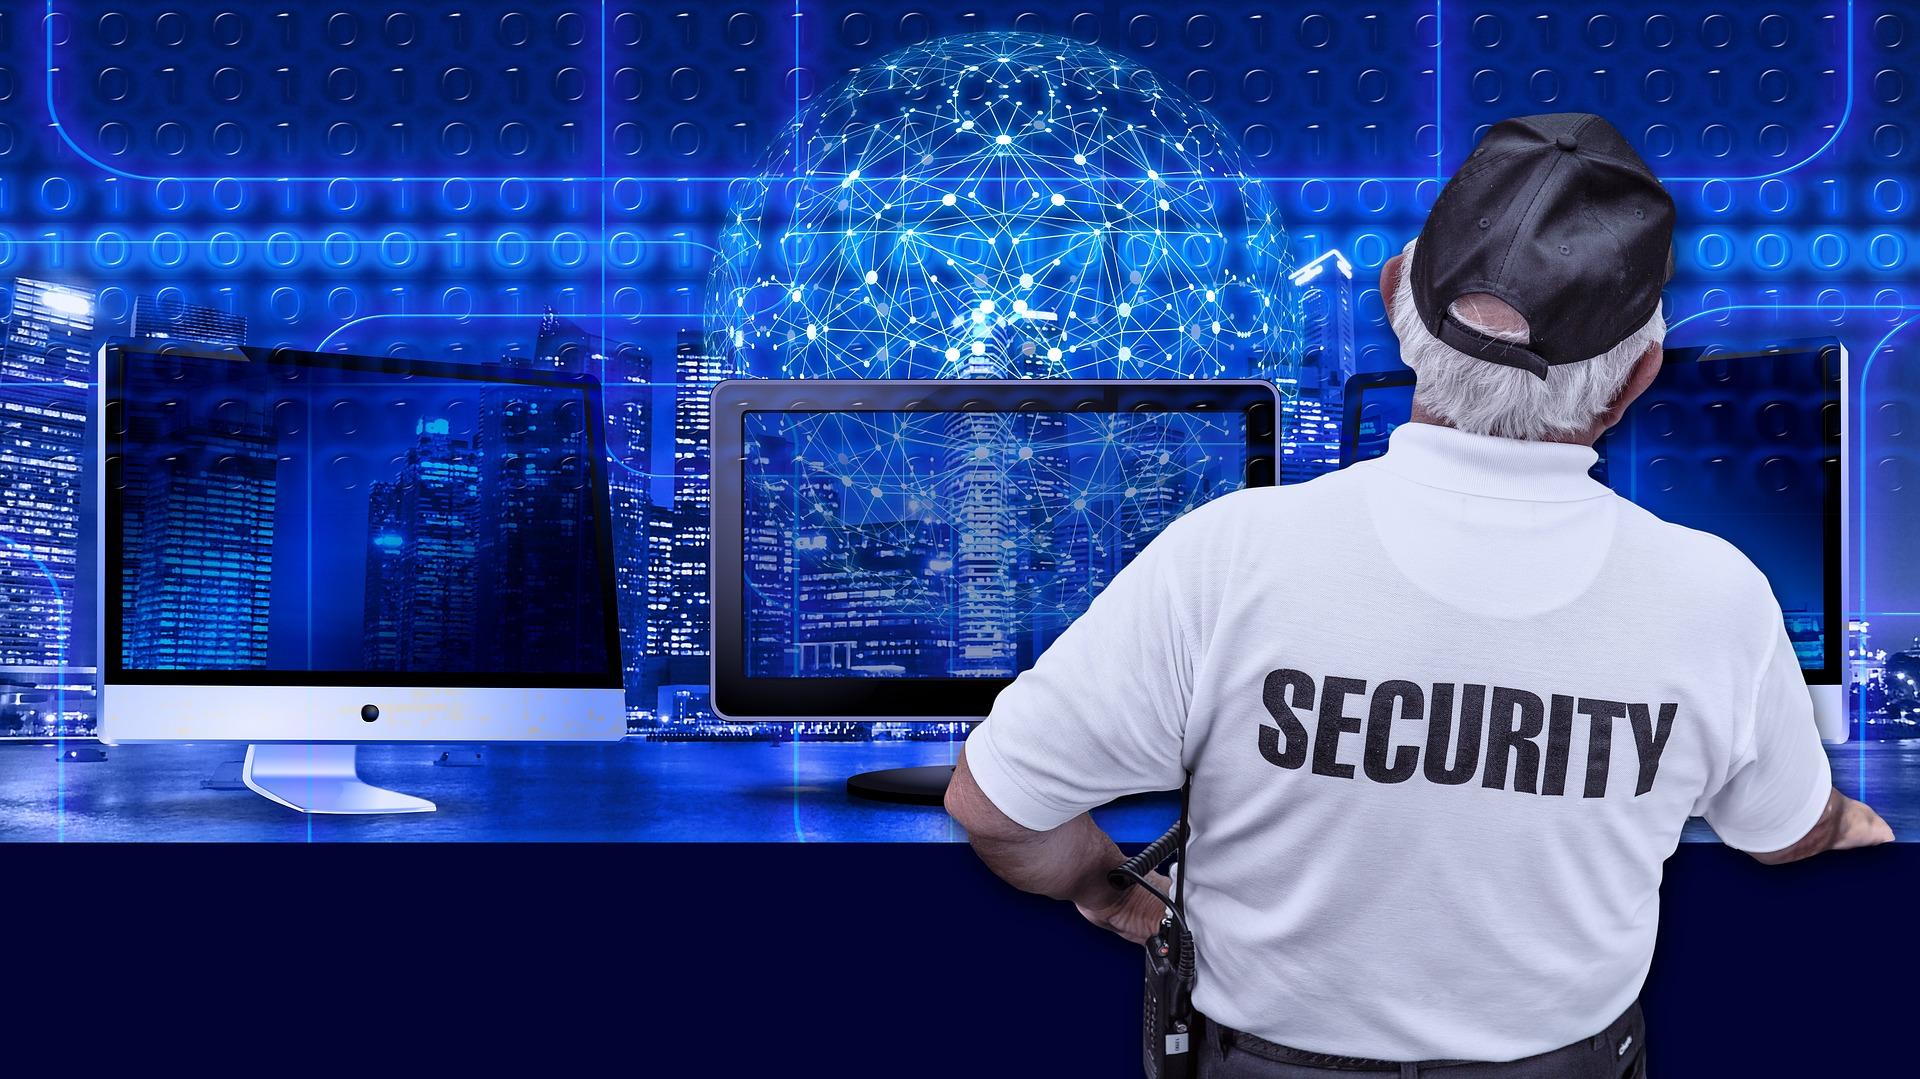 security-4026783_1920